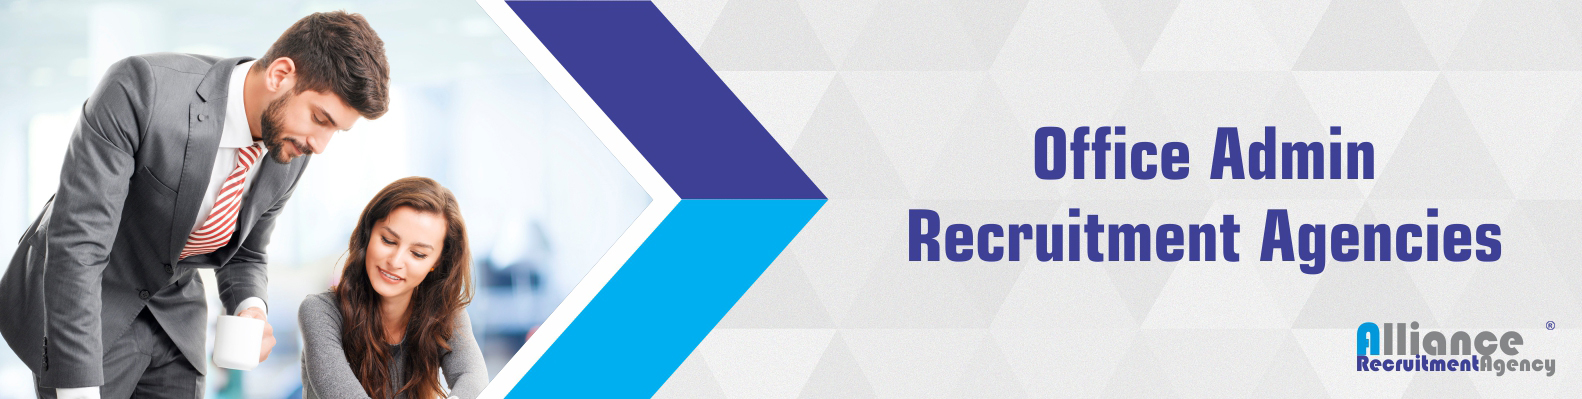 Recruitment Agencies - Recruitment Agencies Administration